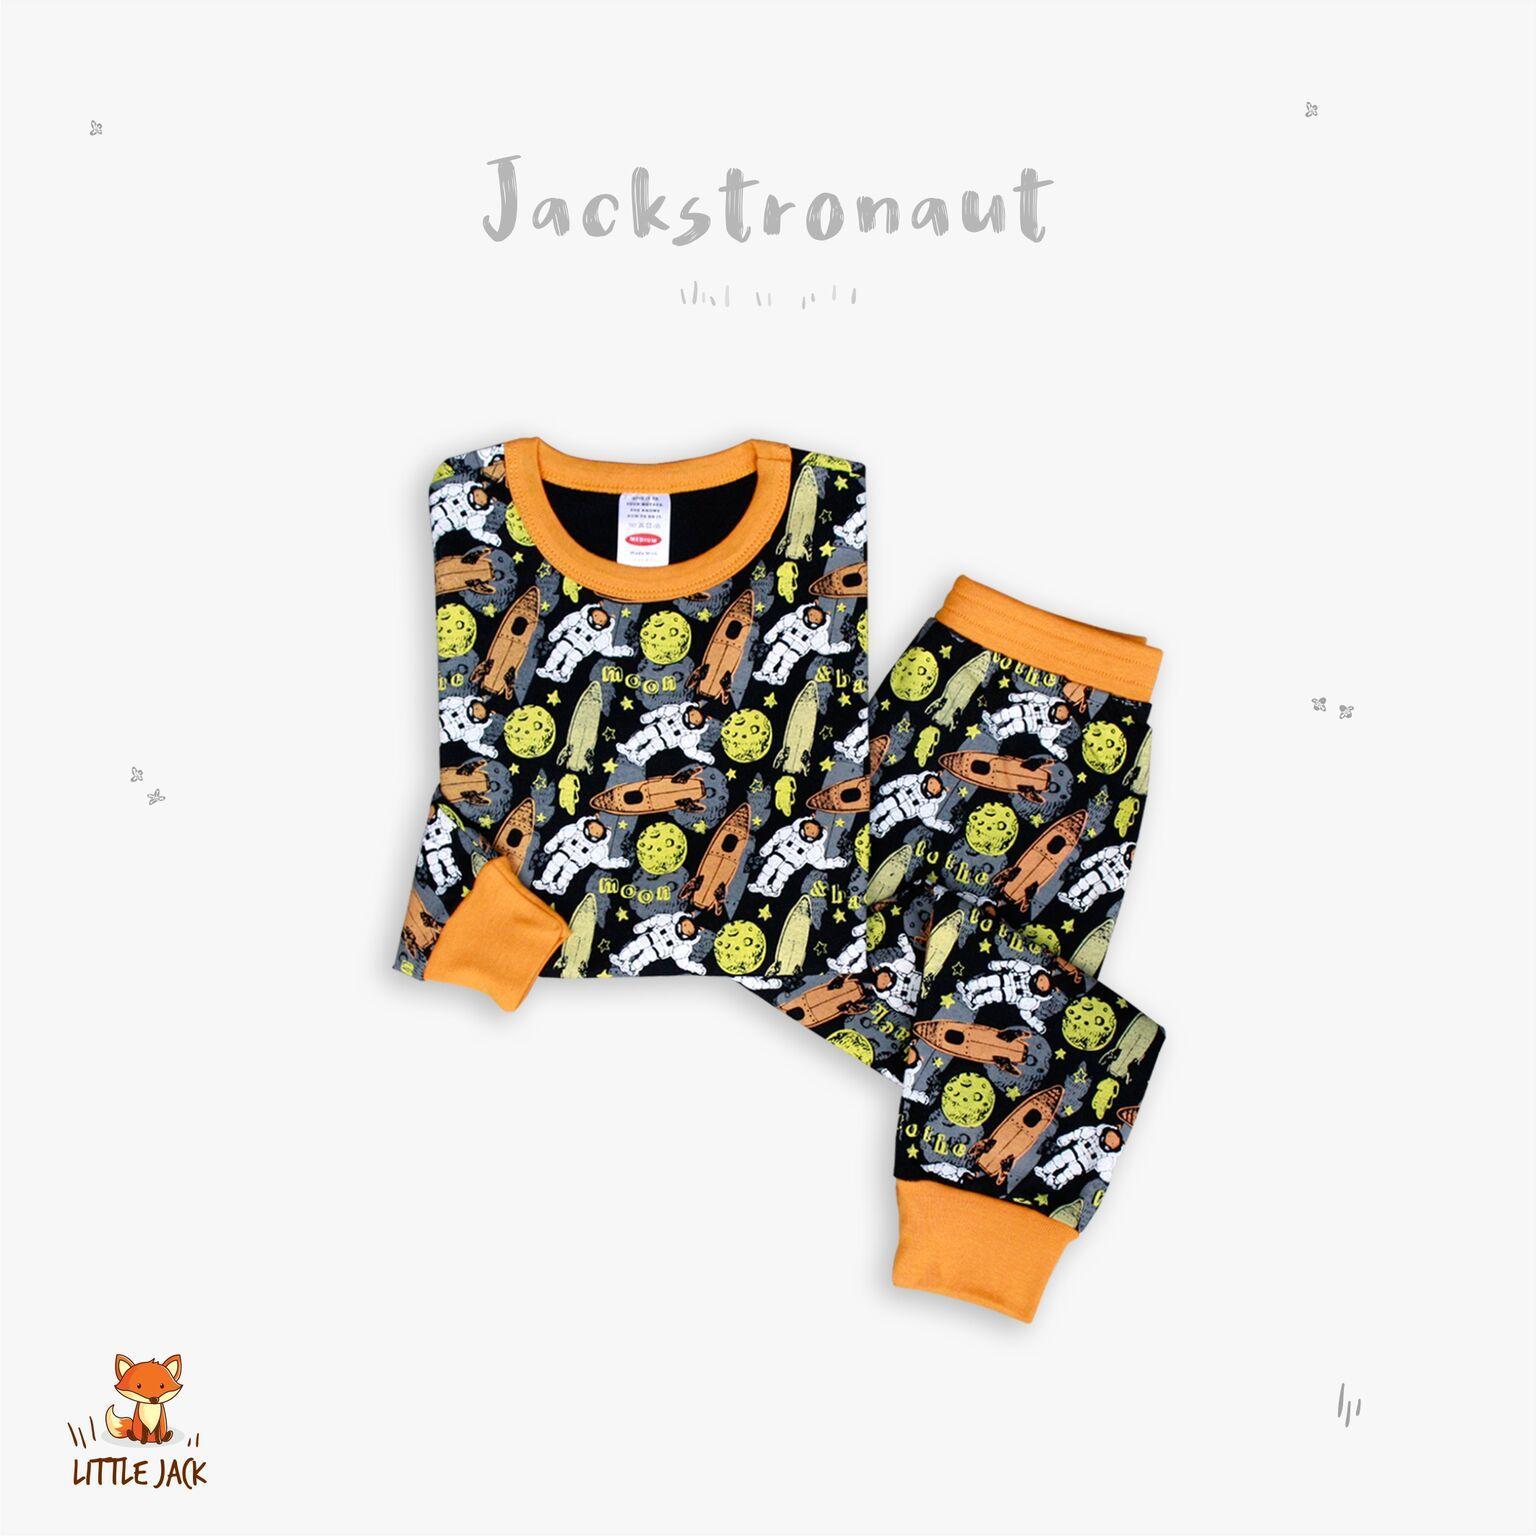 Jackstronaut Piyama Anak Laki Perempuan Cowo Cewe/ Baju Bayi Lucu Pajamas Kids